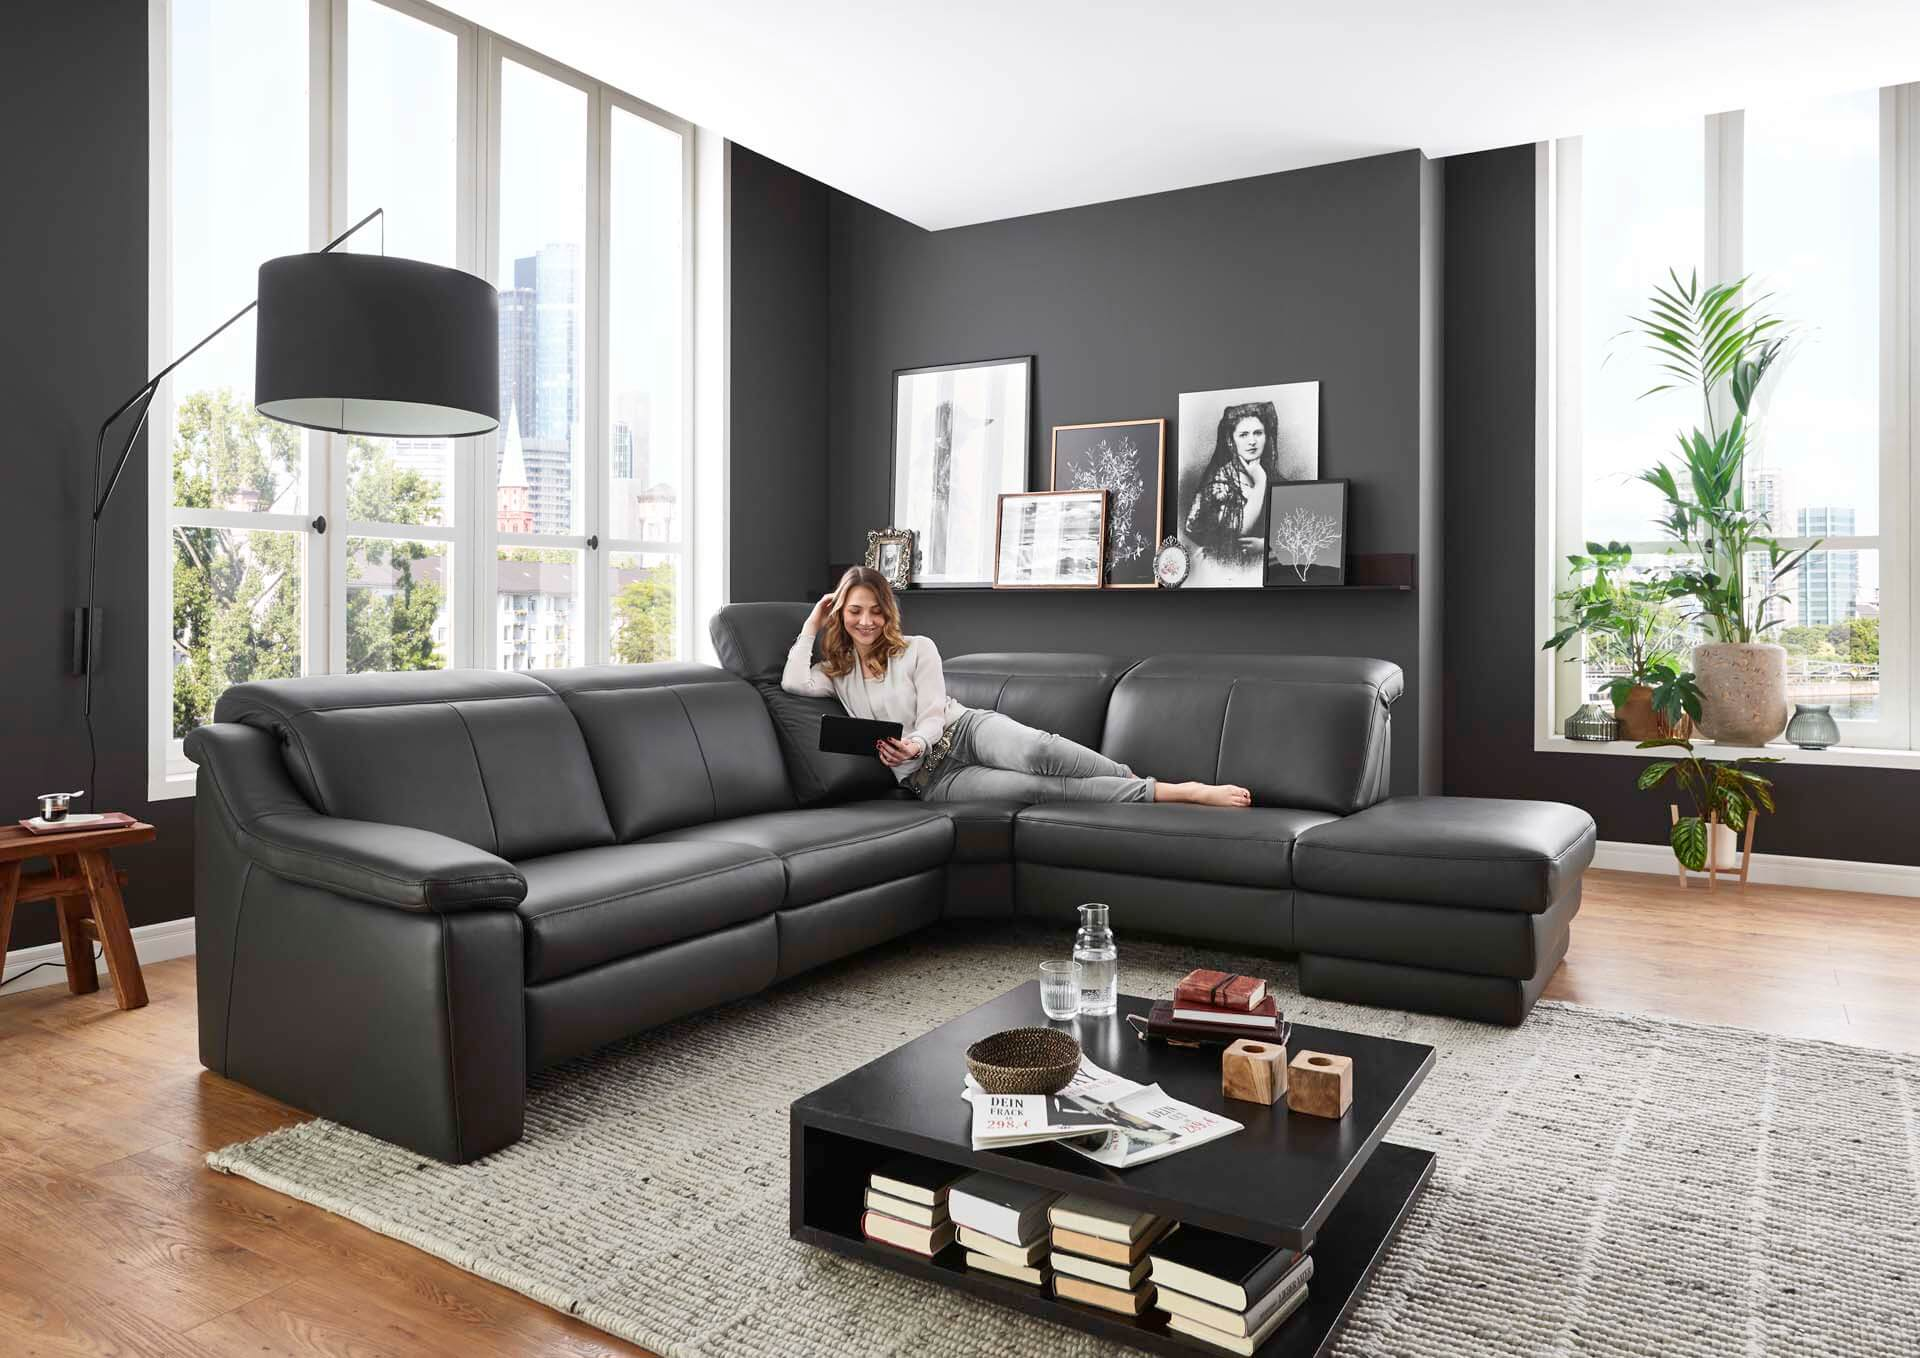 Sofa-Harlem-Com4Lux1